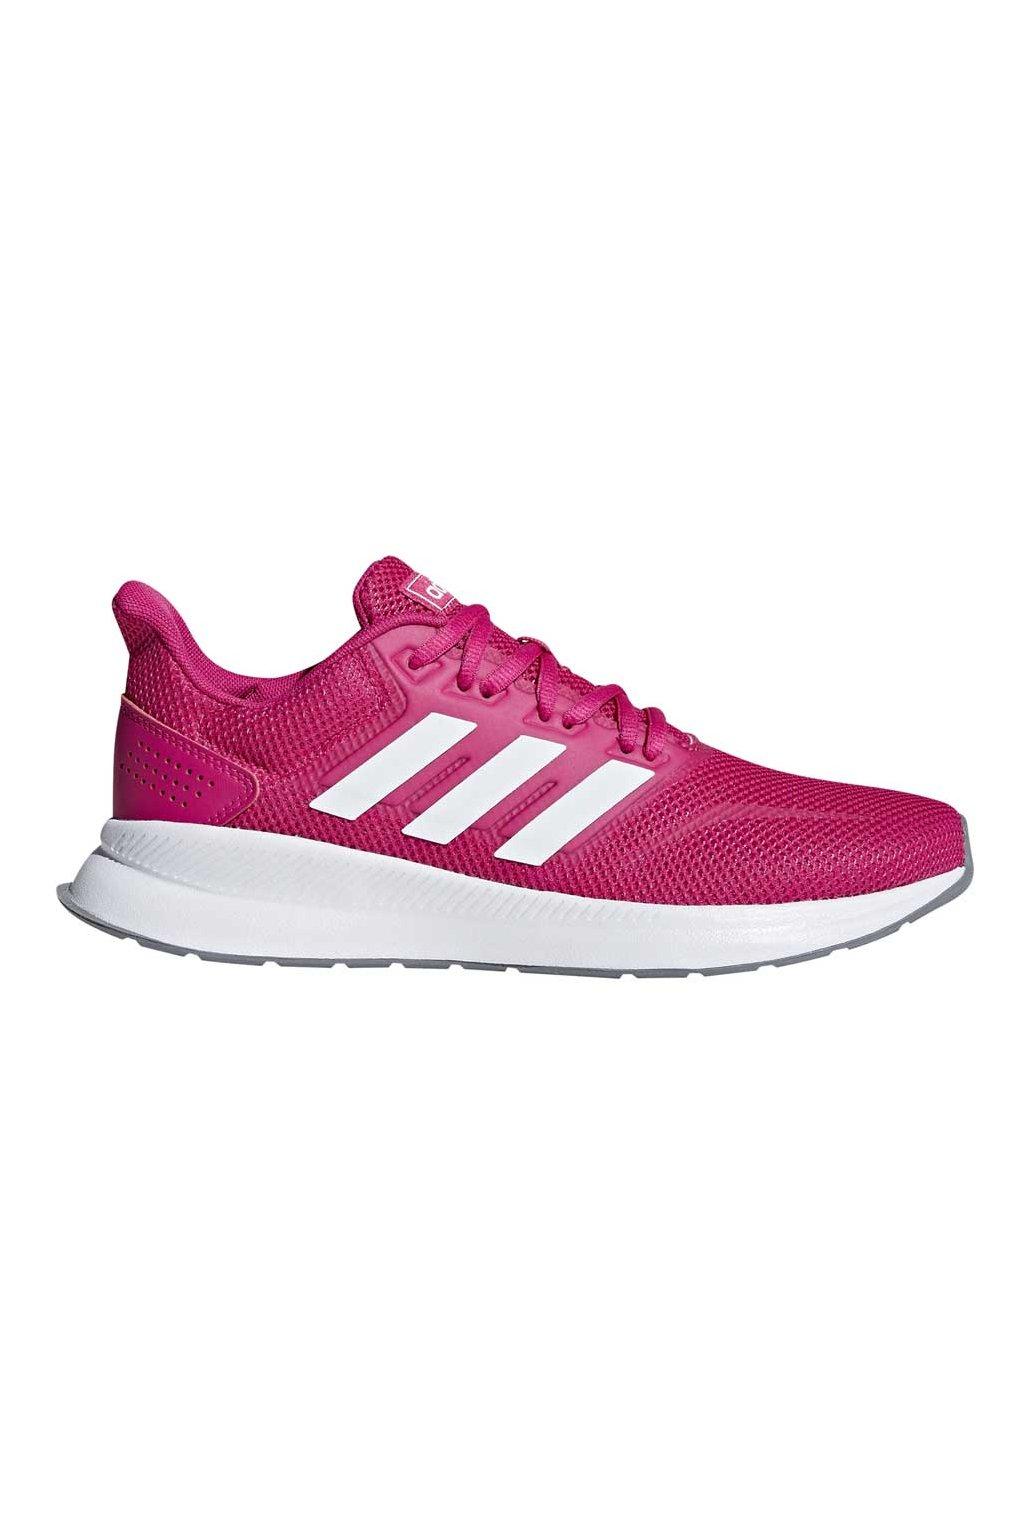 Dámska bežecká obuv adidas Runfalcon pink F36219